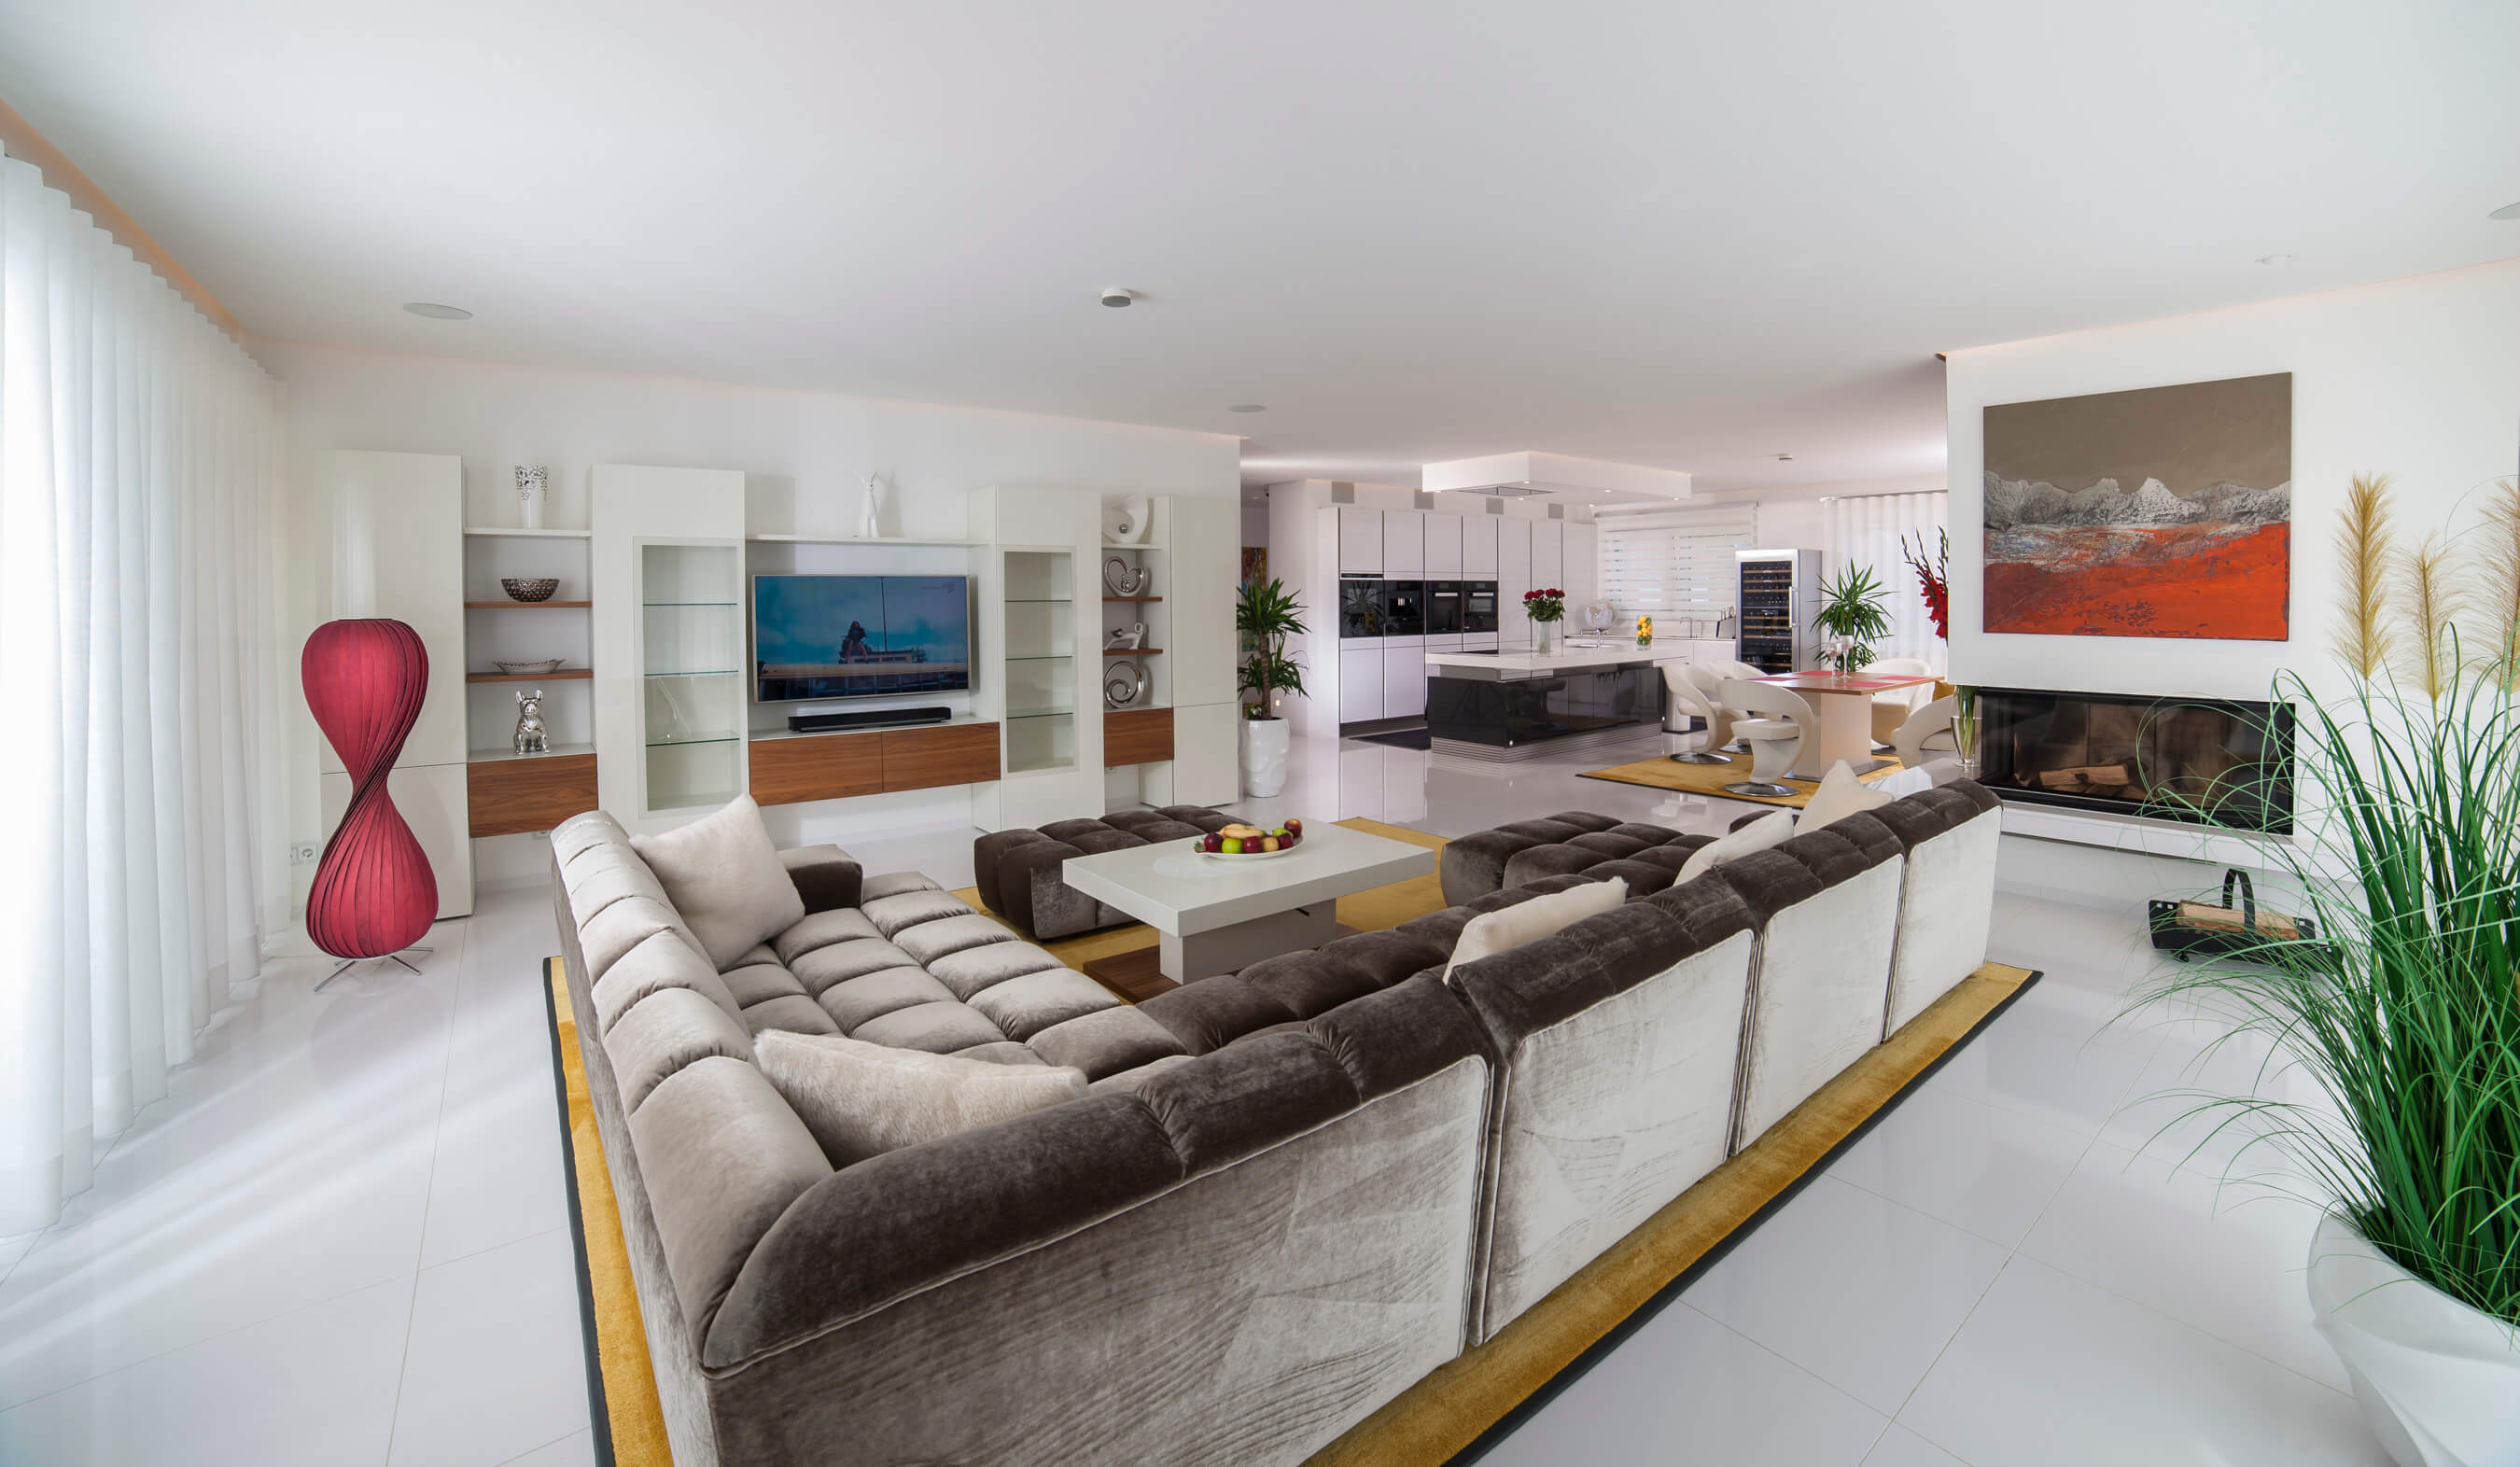 Designs For Homes Interior | Interior Design Geschmackvoll Und Exklusiv Torsten Muller